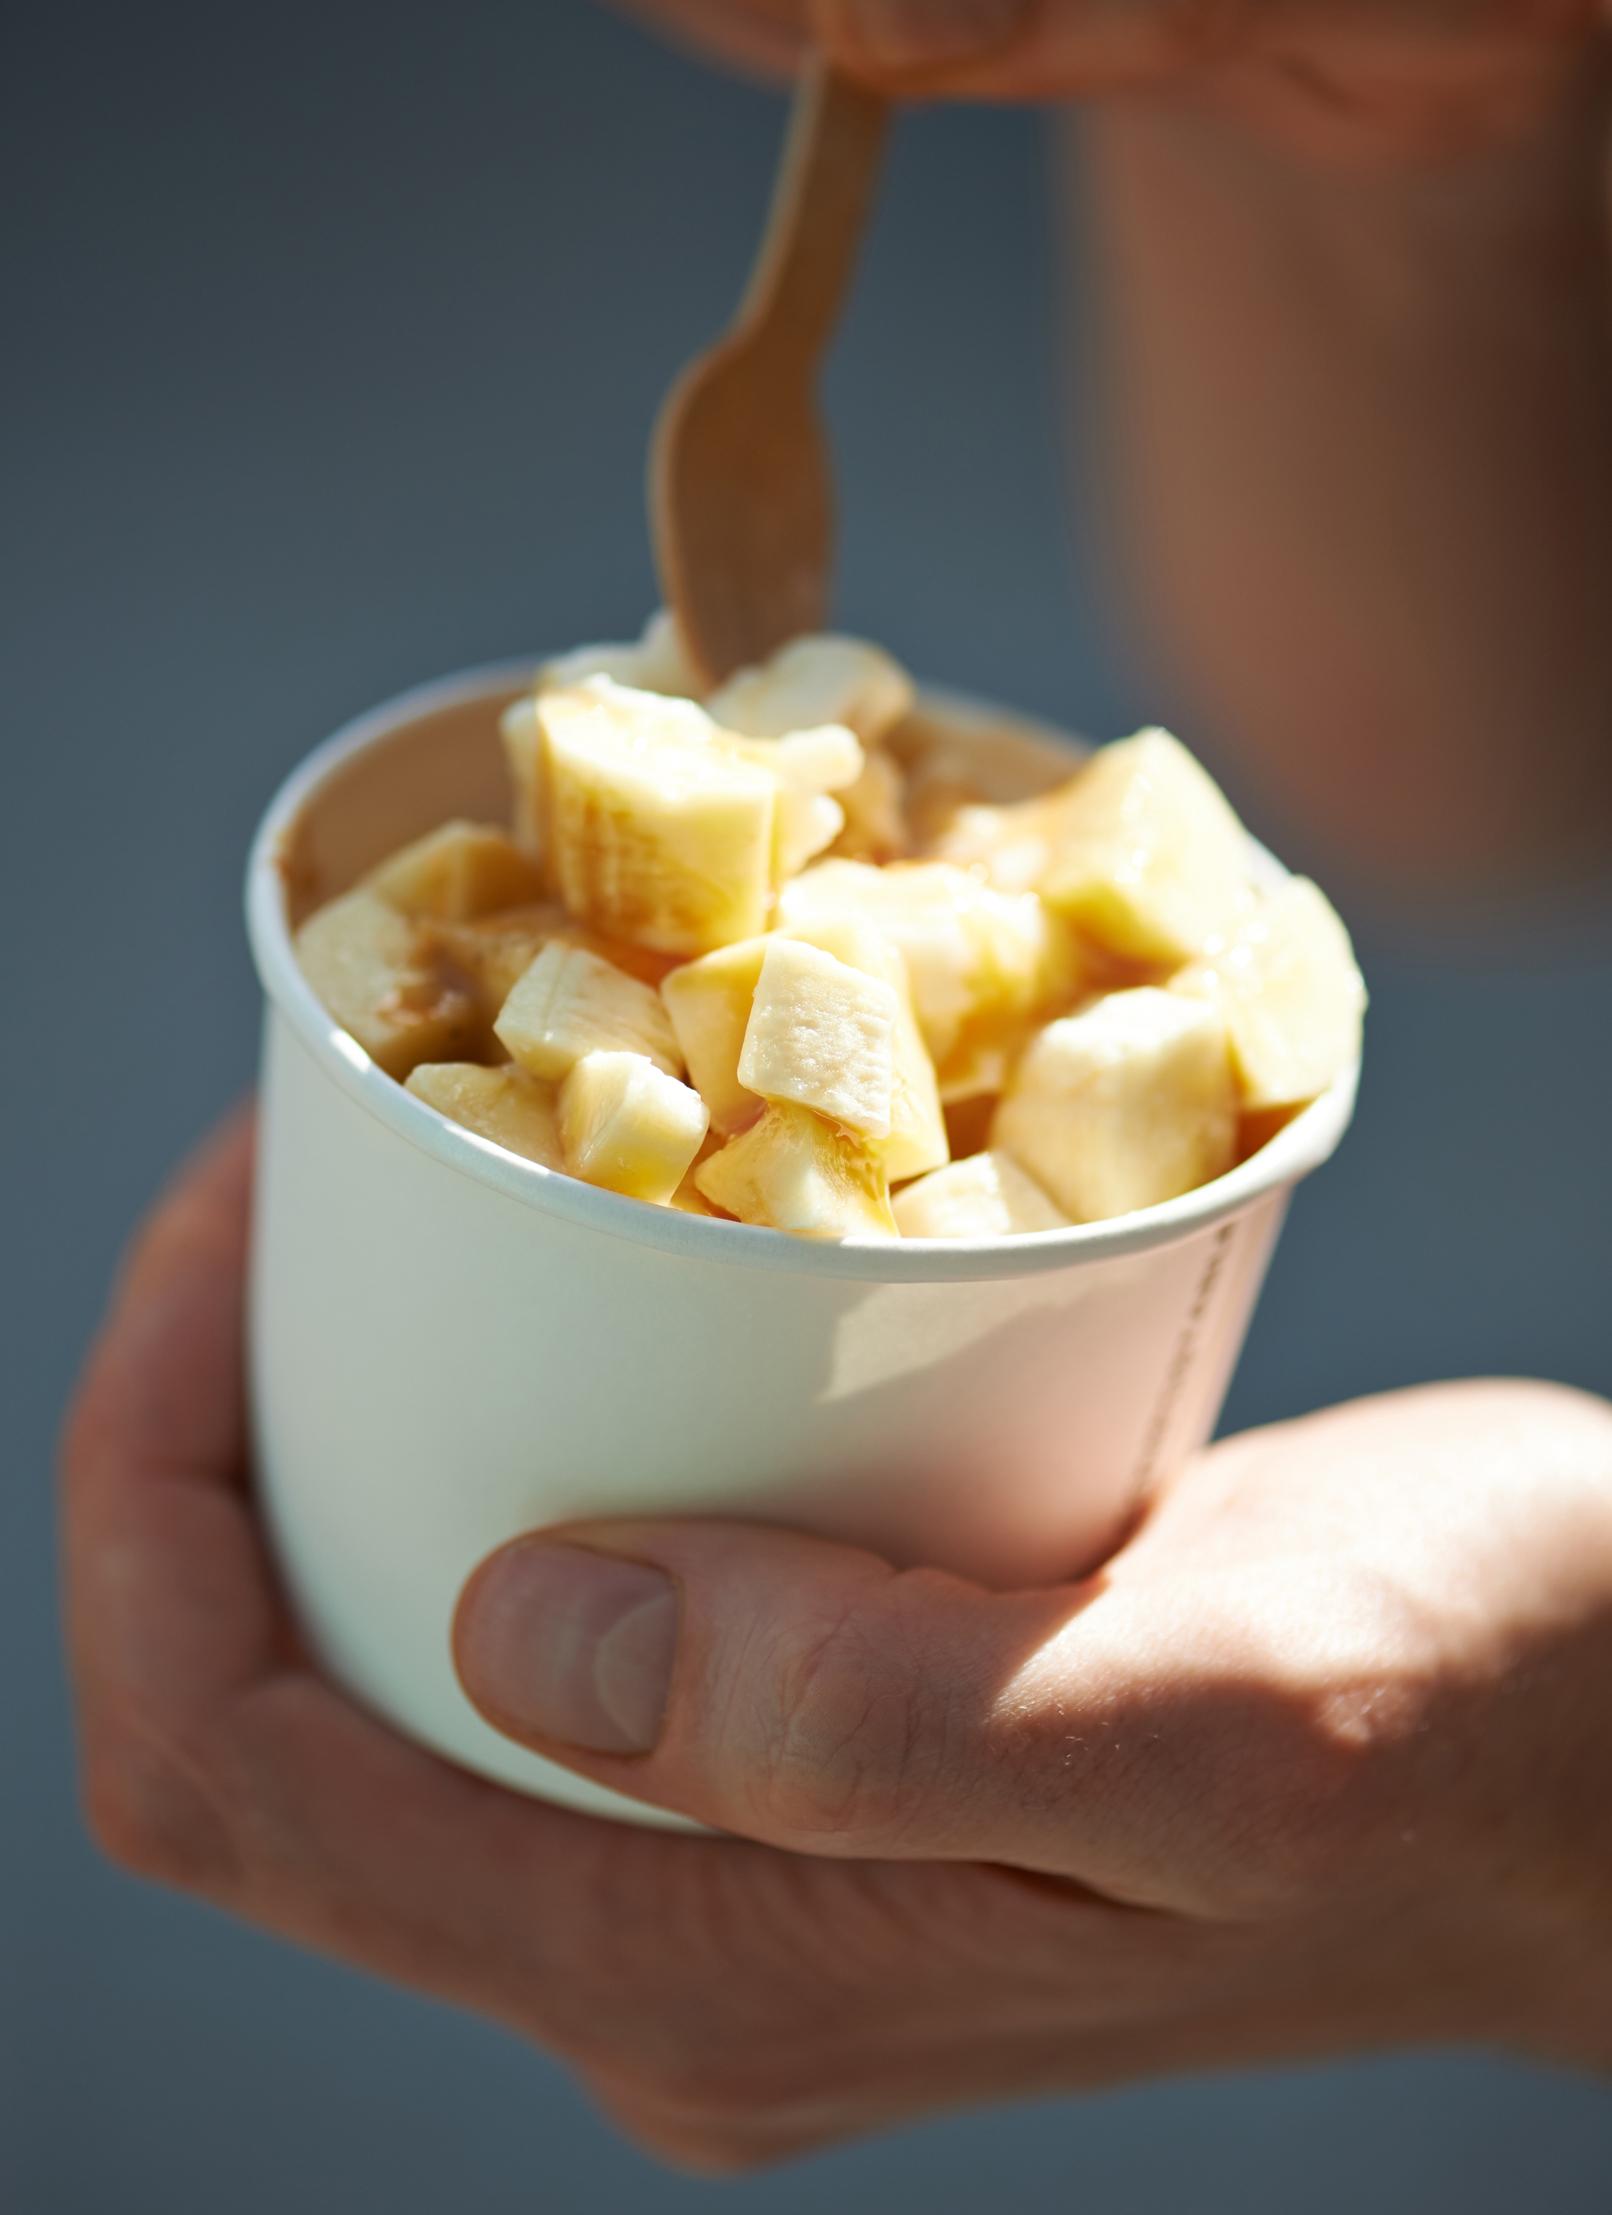 street food photography, frozen yoghurt and bananas